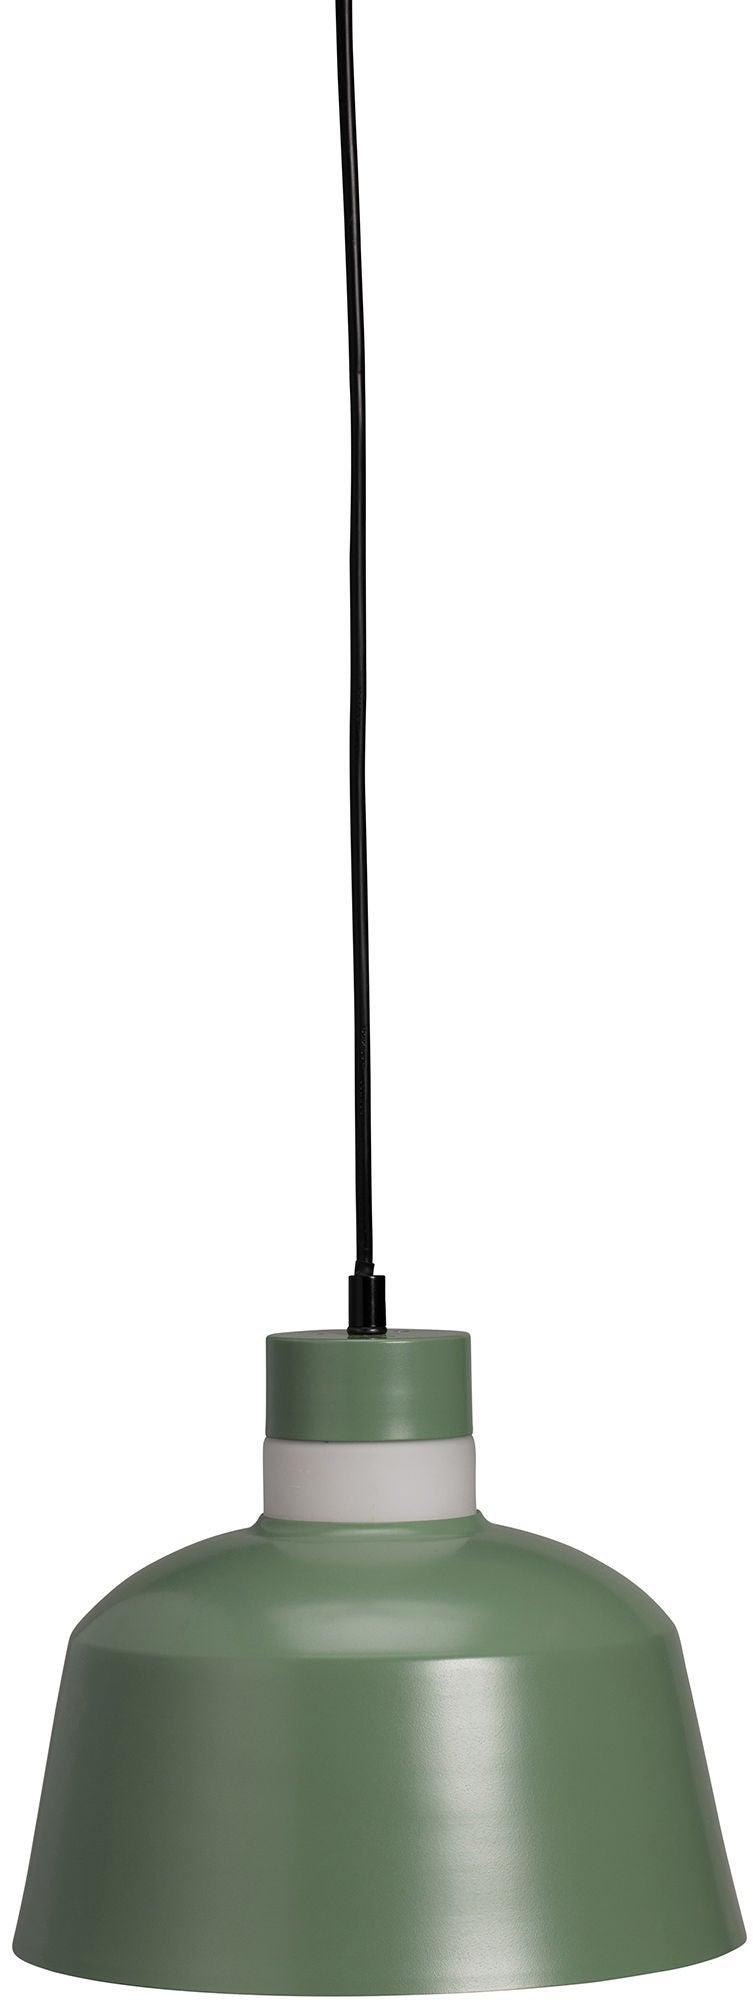 POPP Taklampa Mio, Grön